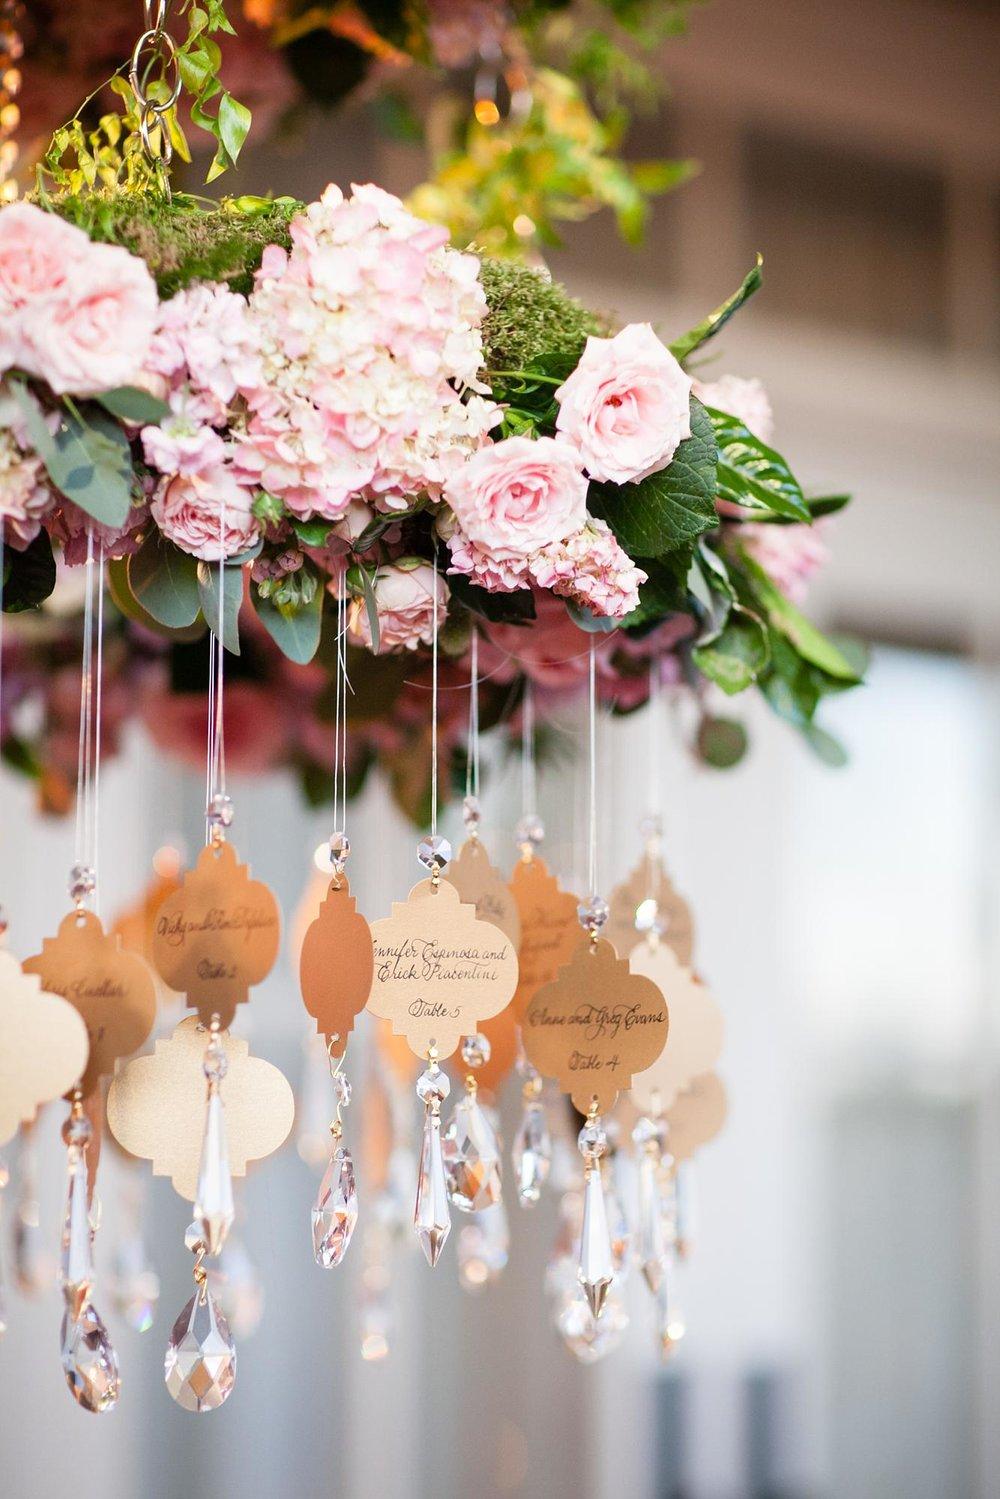 Belmond El Encanto Wedding   Miki & Sonja Photography   mikiandsonja.com